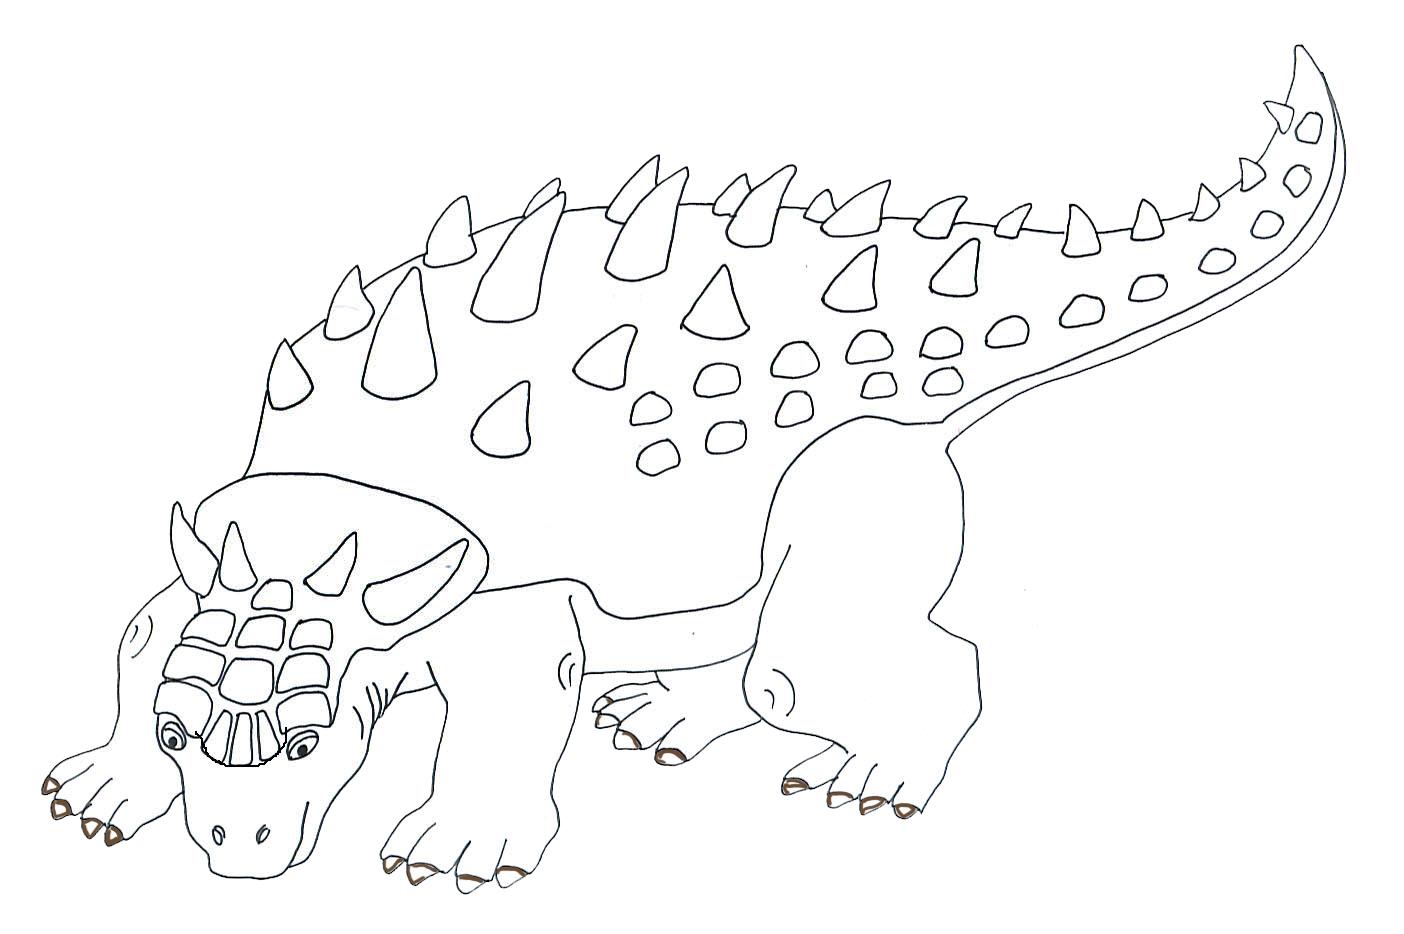 drawing of Anchylosaurus